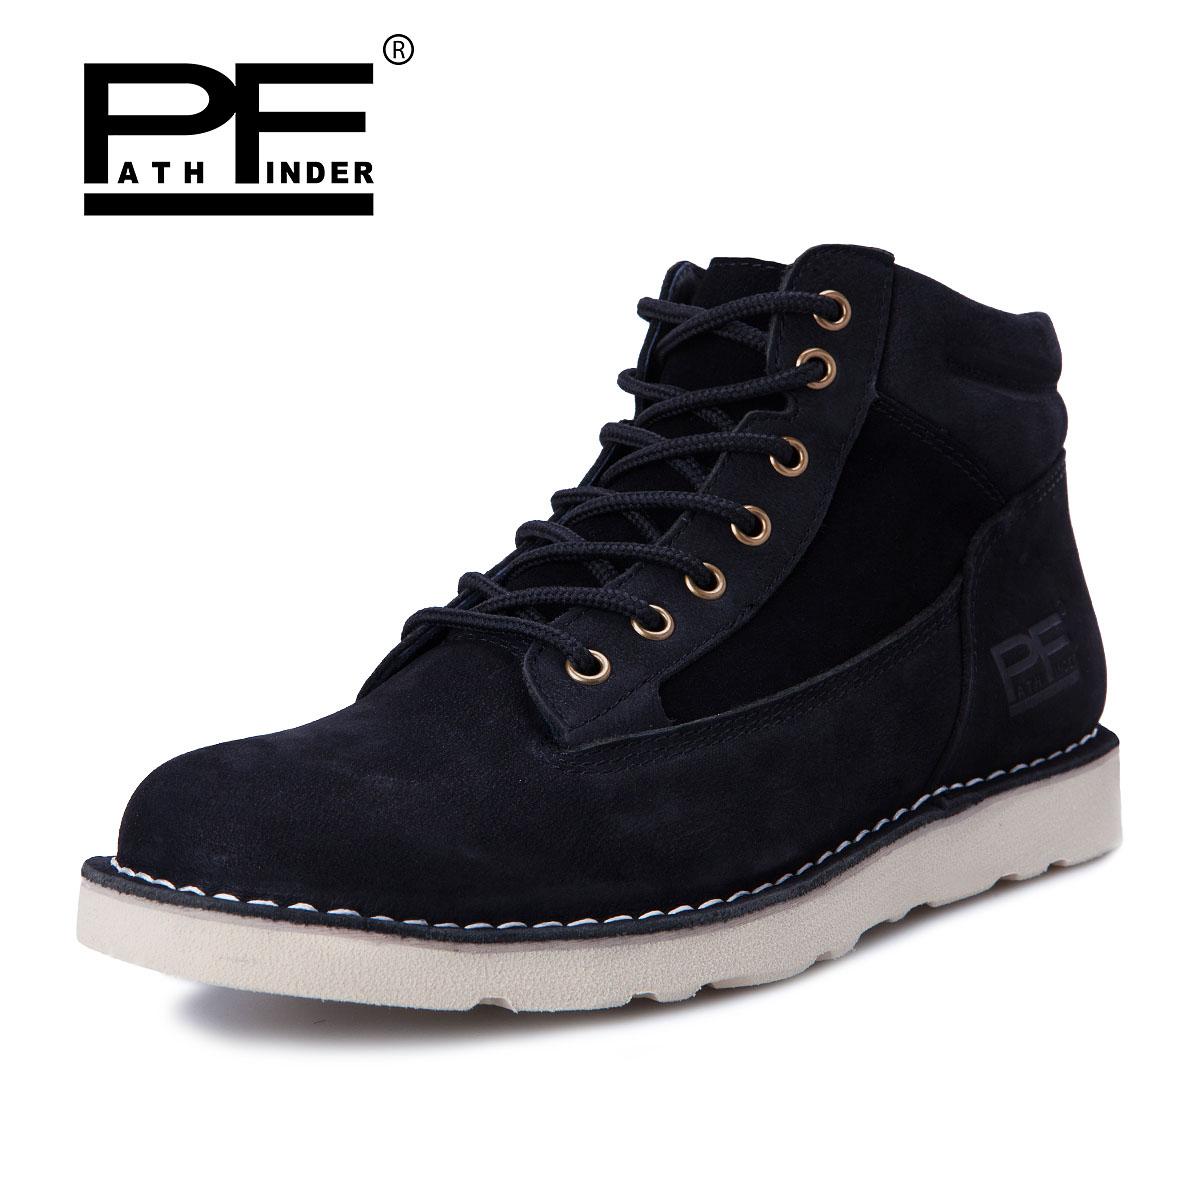 Pathfinder Men Ankle Botas Genuine Leather Warm Winter Botas Men Brand Casual font b Cowboy b